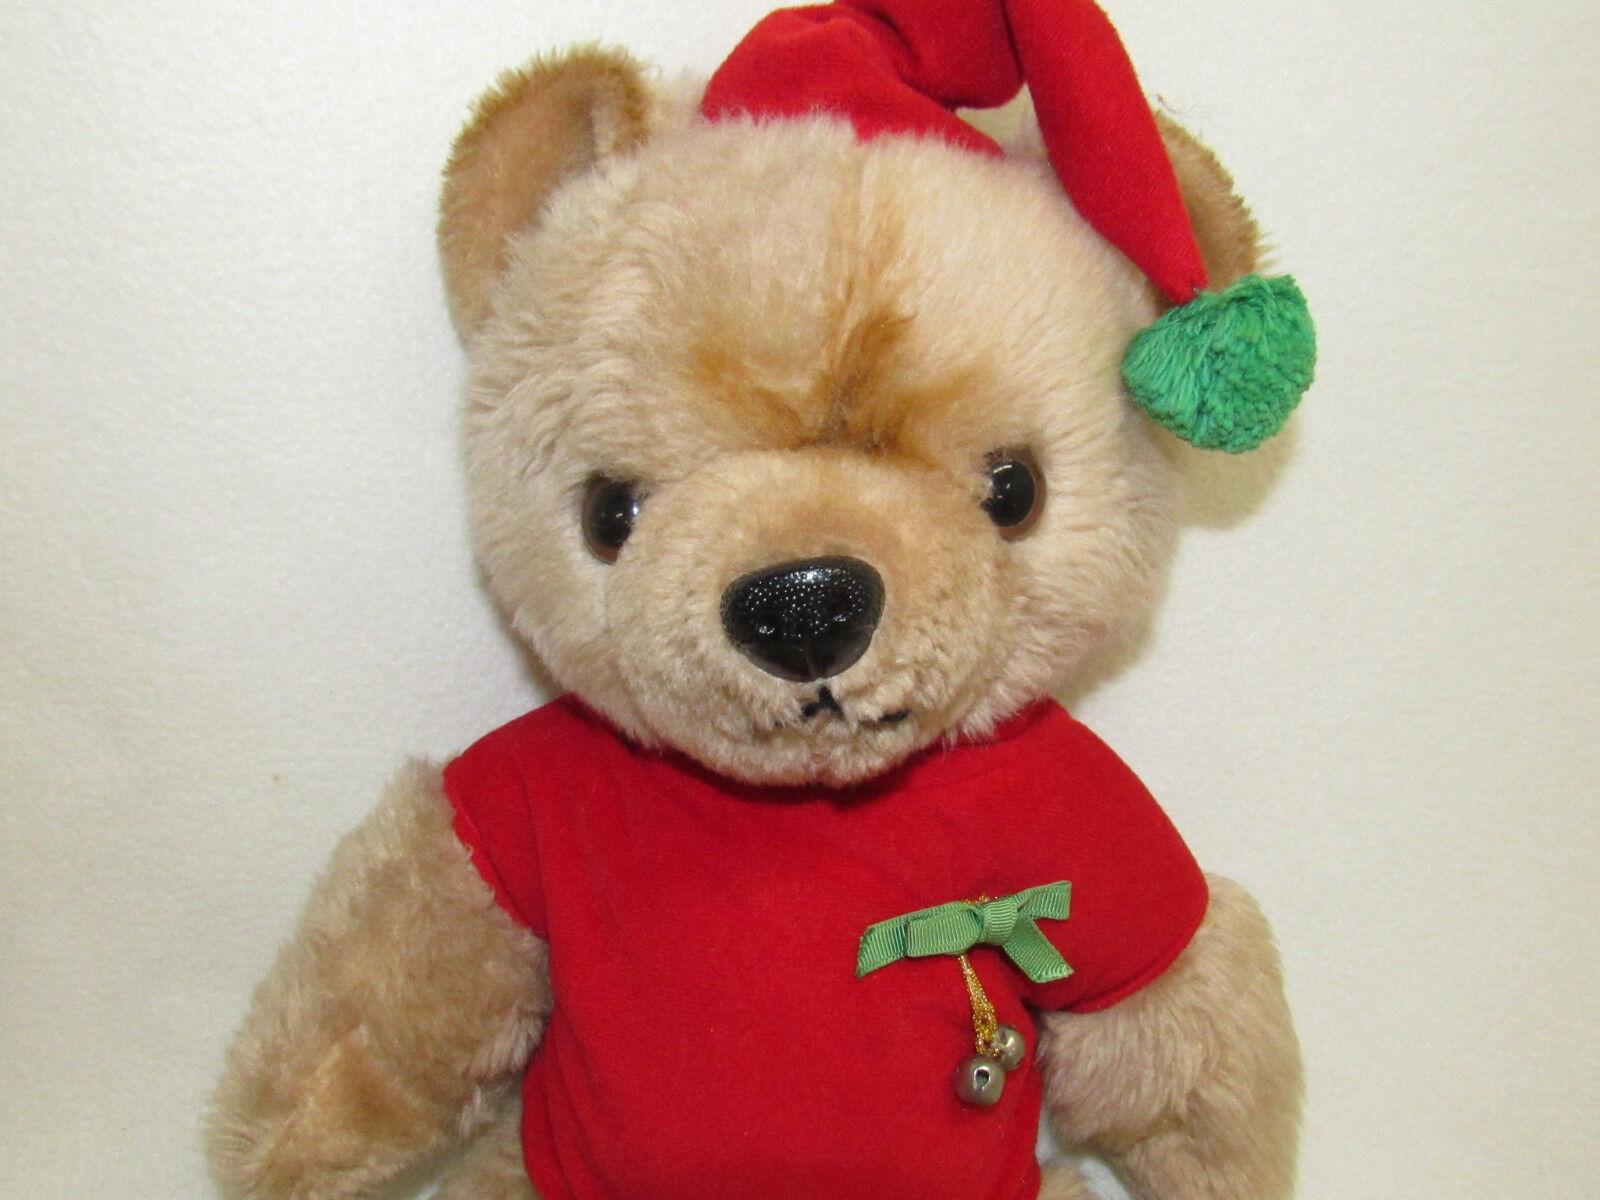 VTG VTG VTG MON PETIT CHOU LTD CHRISTMAS TEDDY BEAR JOINTED PLUSH f7f454